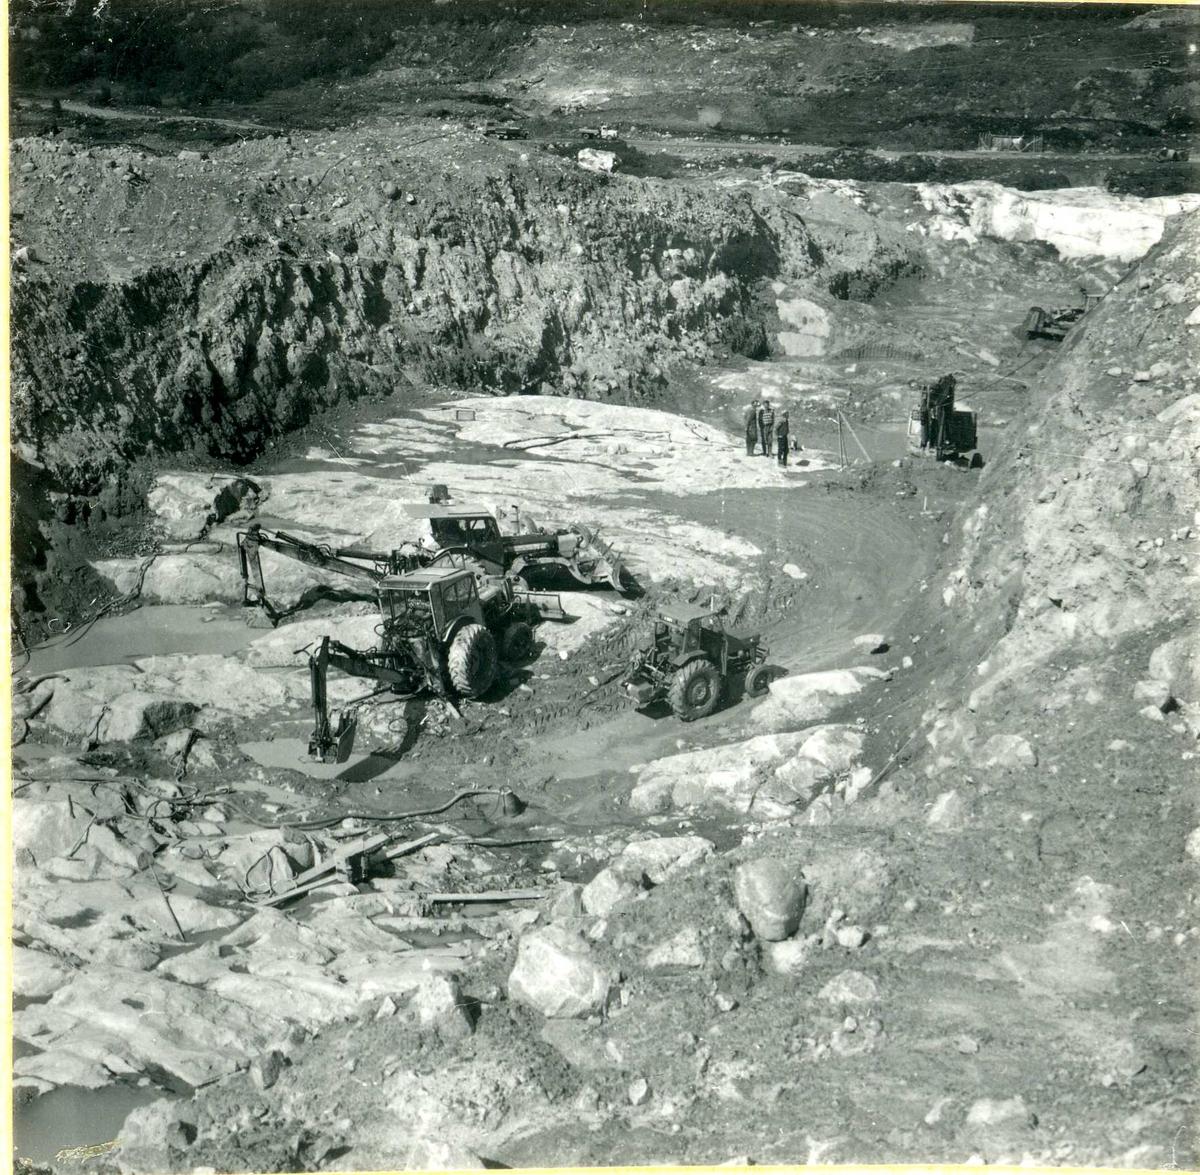 847-3 Rensk damfot Bitdalen